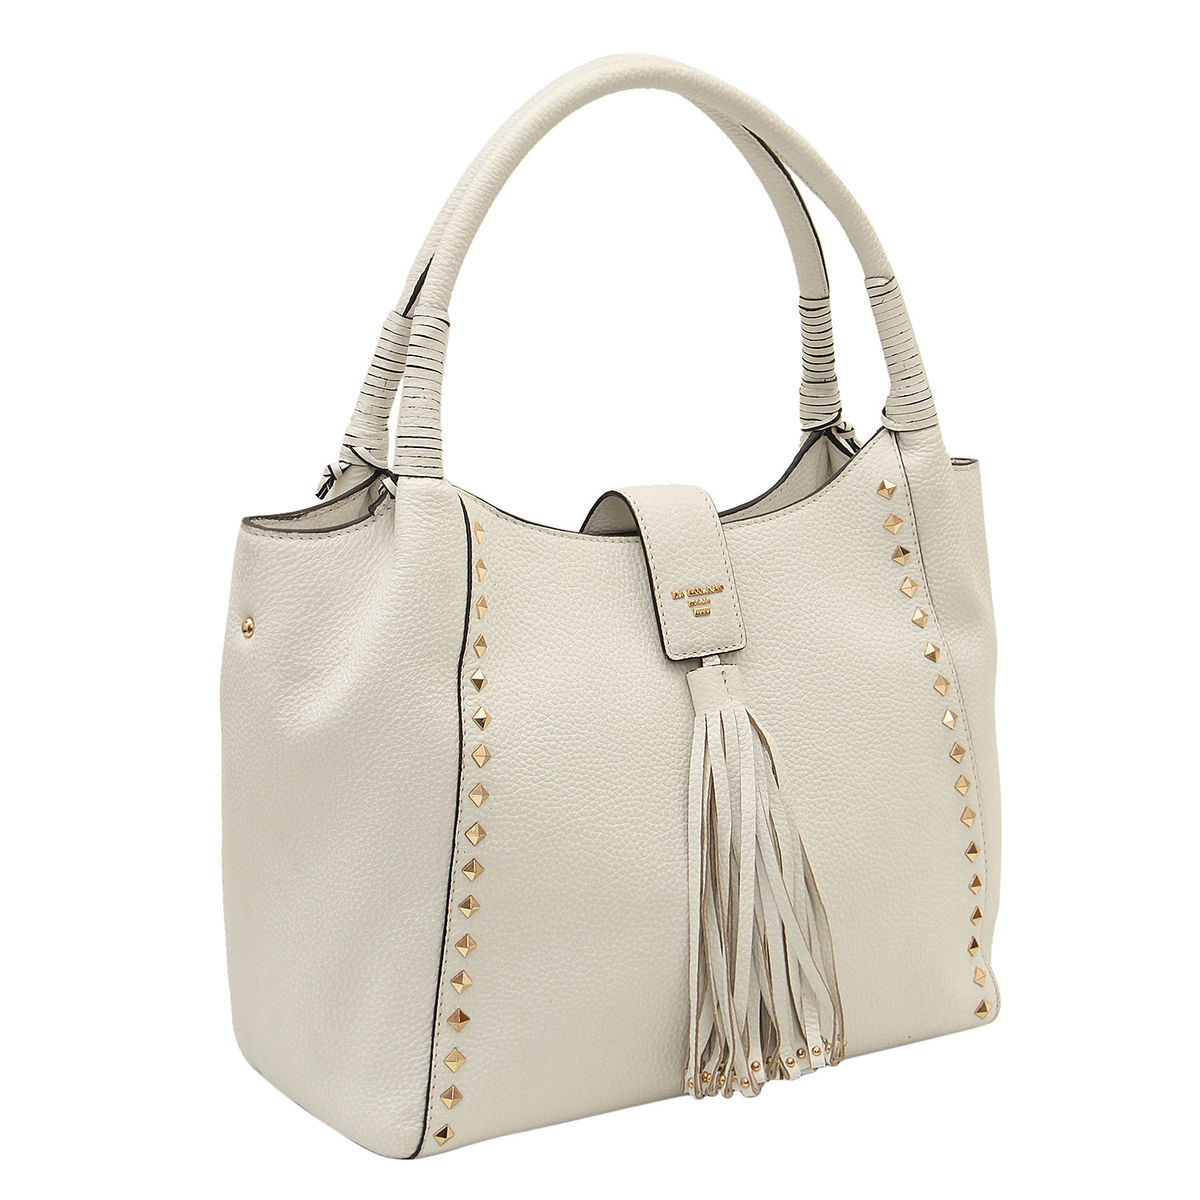 a1c1229b2b Da Milano White Long Handle Bag